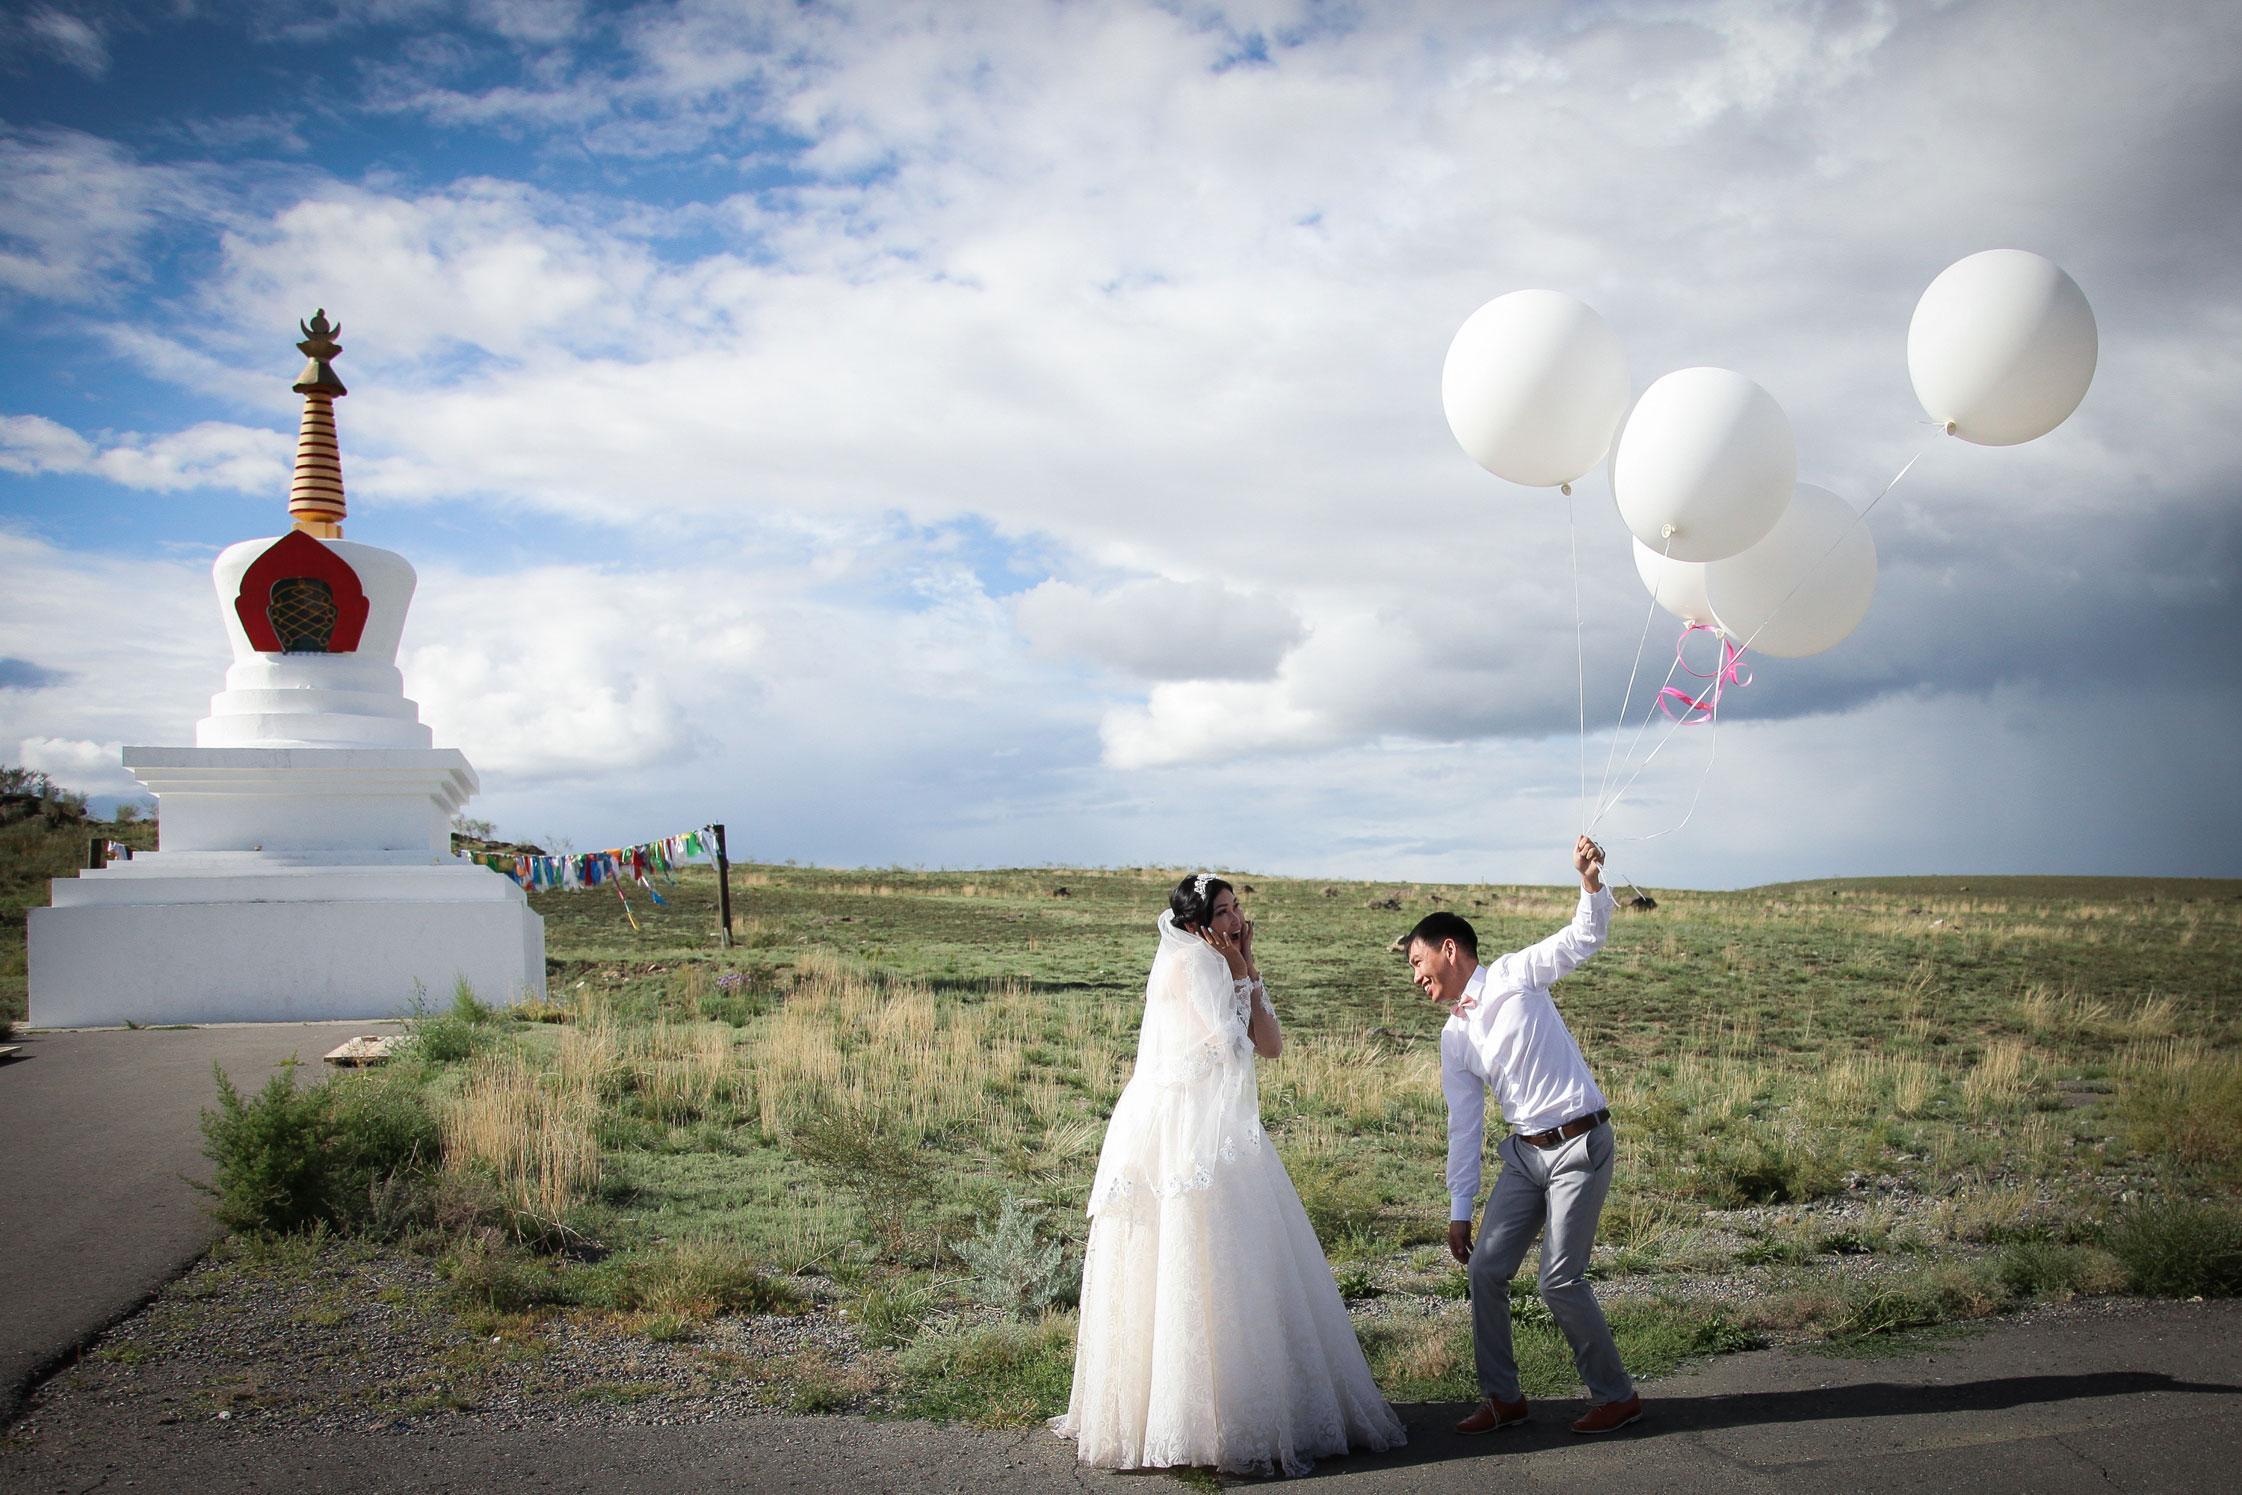 Tuvan wedding, Kyzyl.